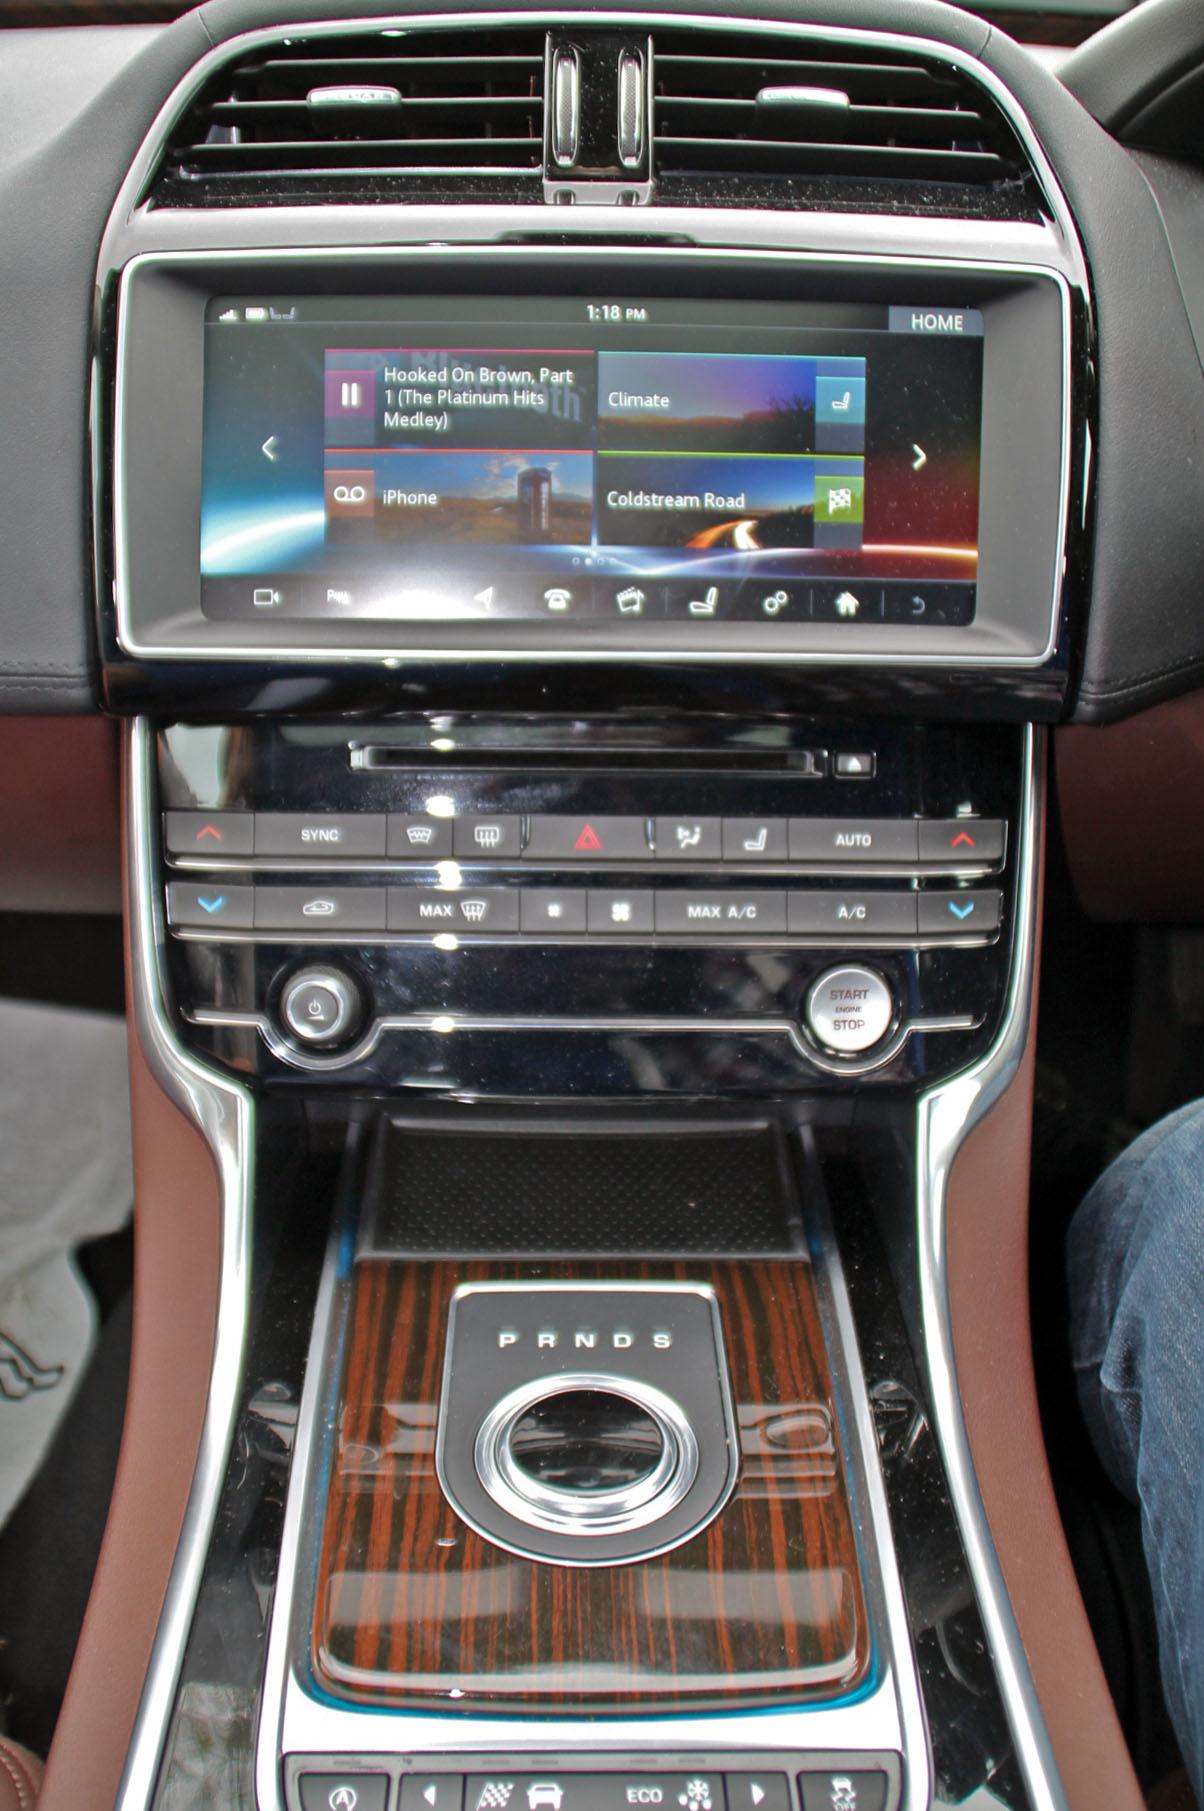 Jaguar XE, Jaguar XE review, dadbloguk, dadbloguk.com, school run dad